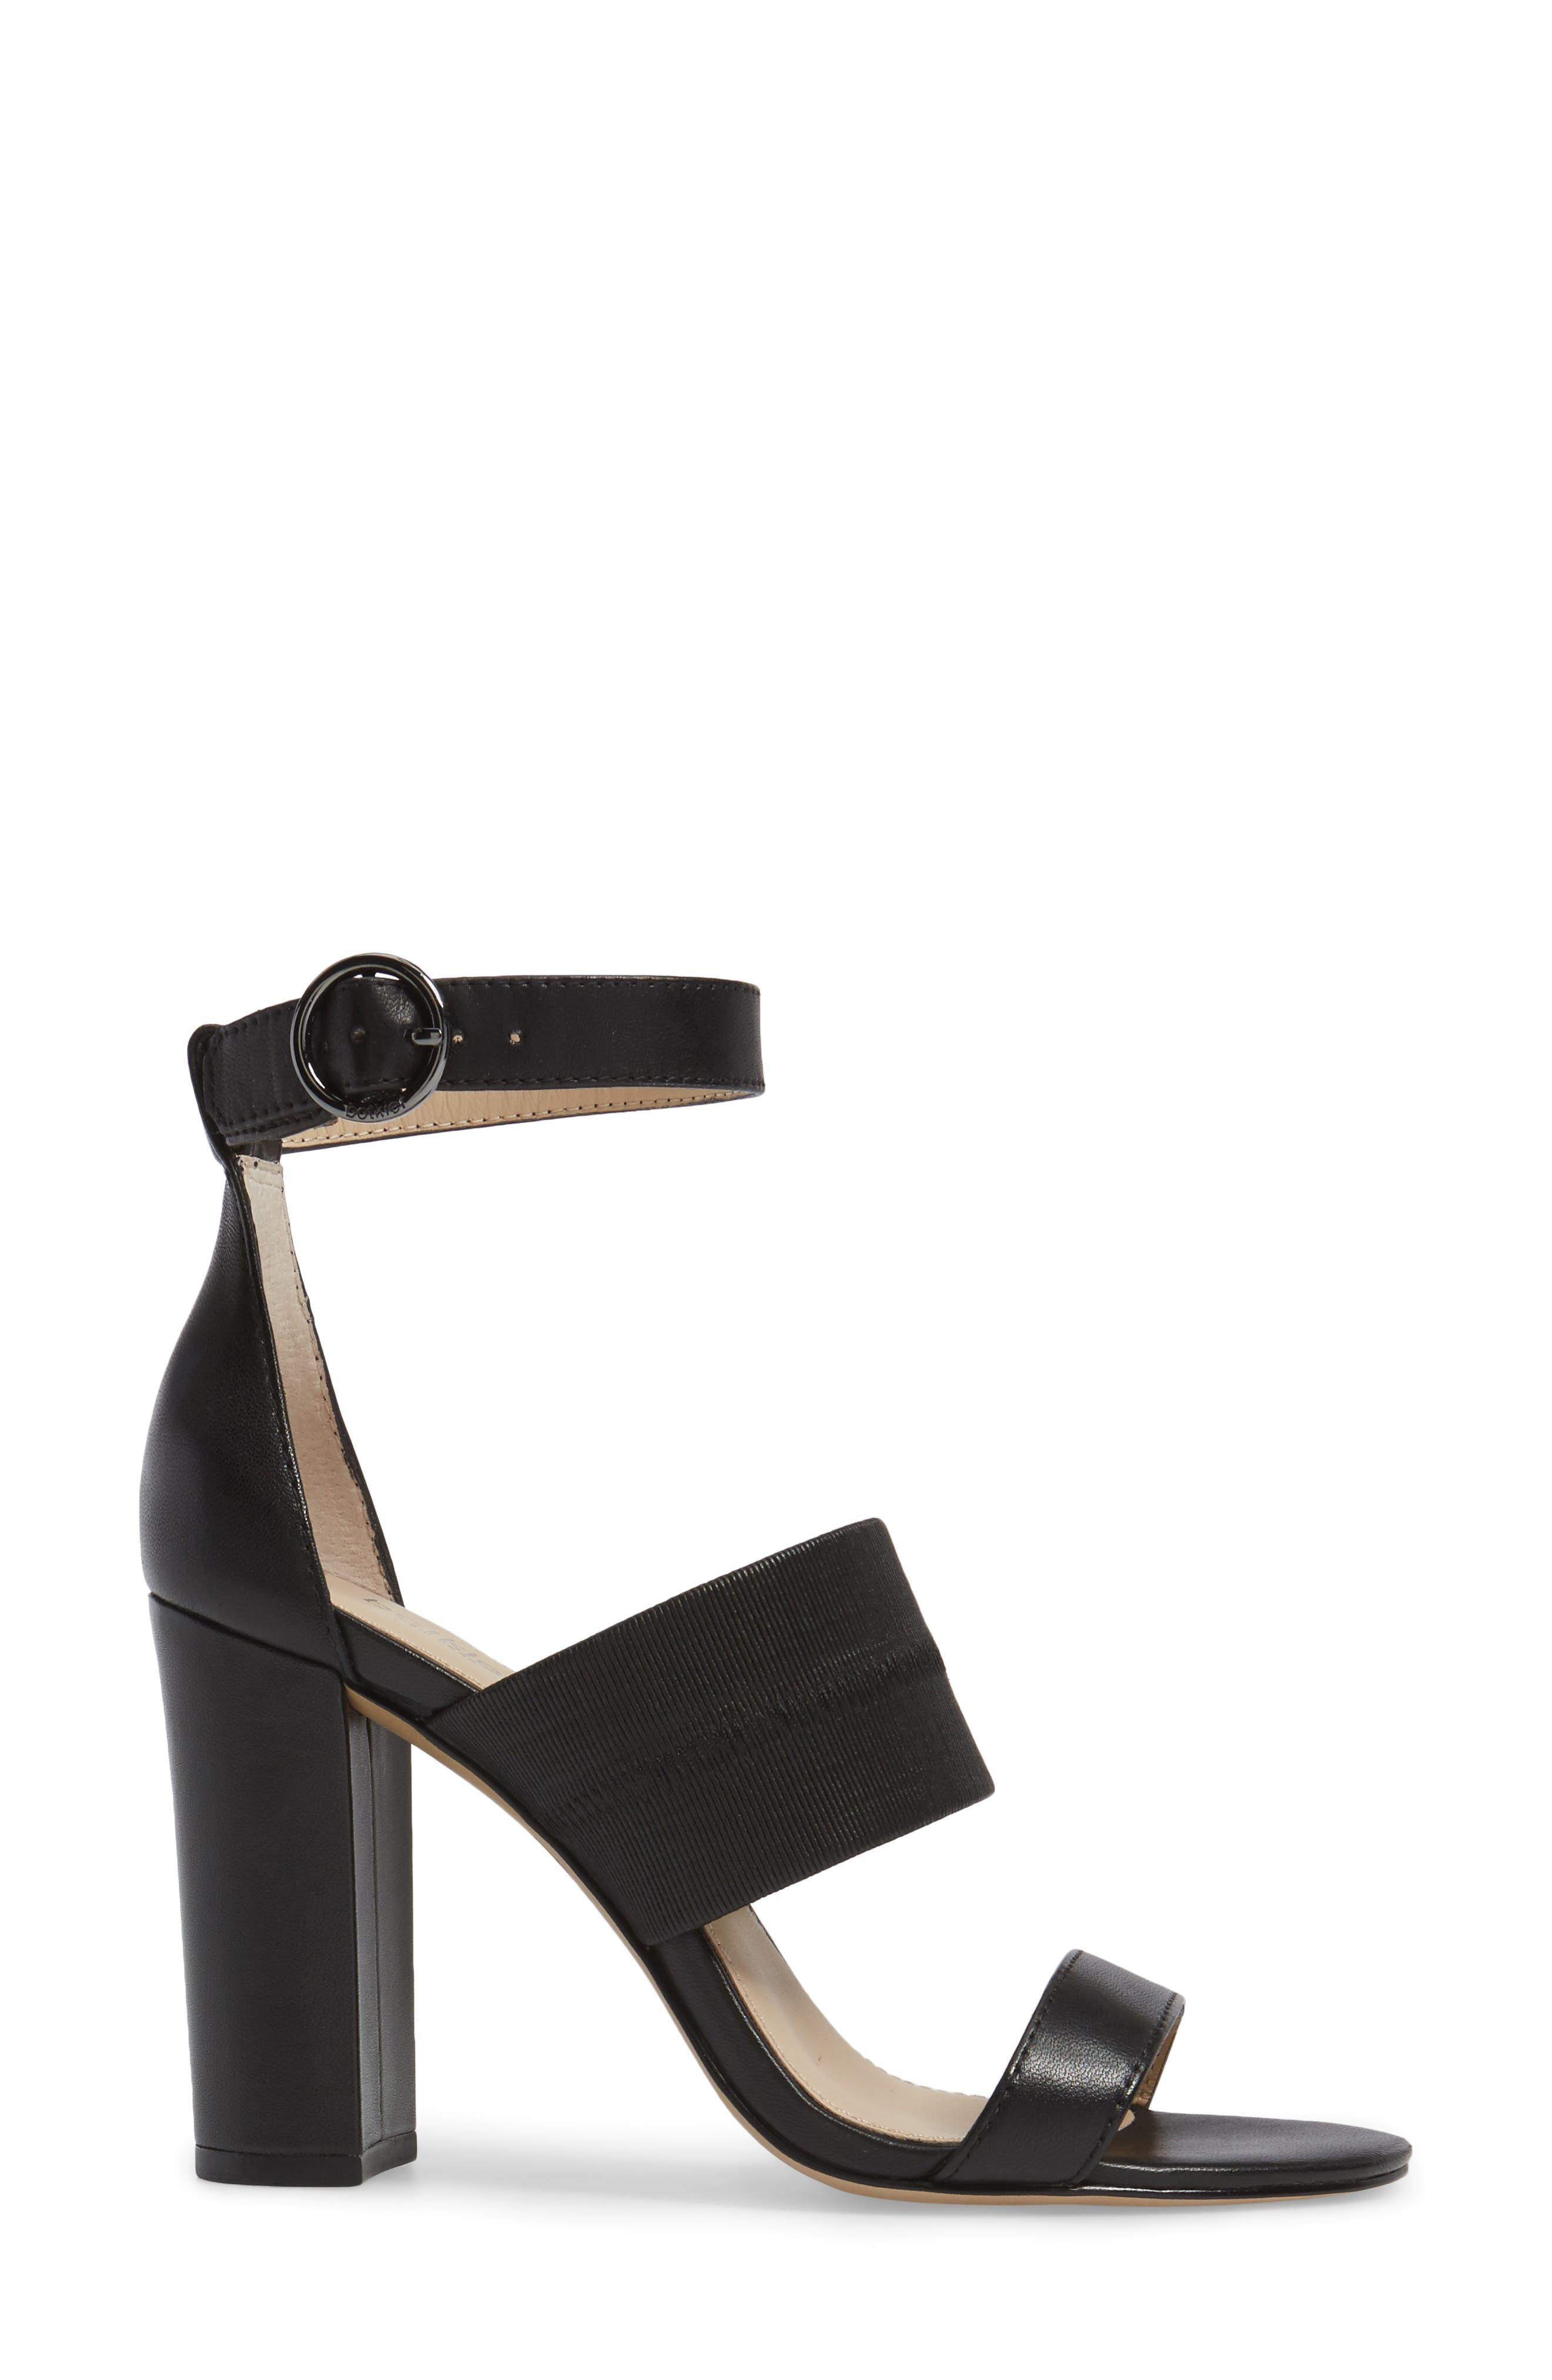 Gisella Ankle Strap Sandal,                             Alternate thumbnail 3, color,                             Black Leather